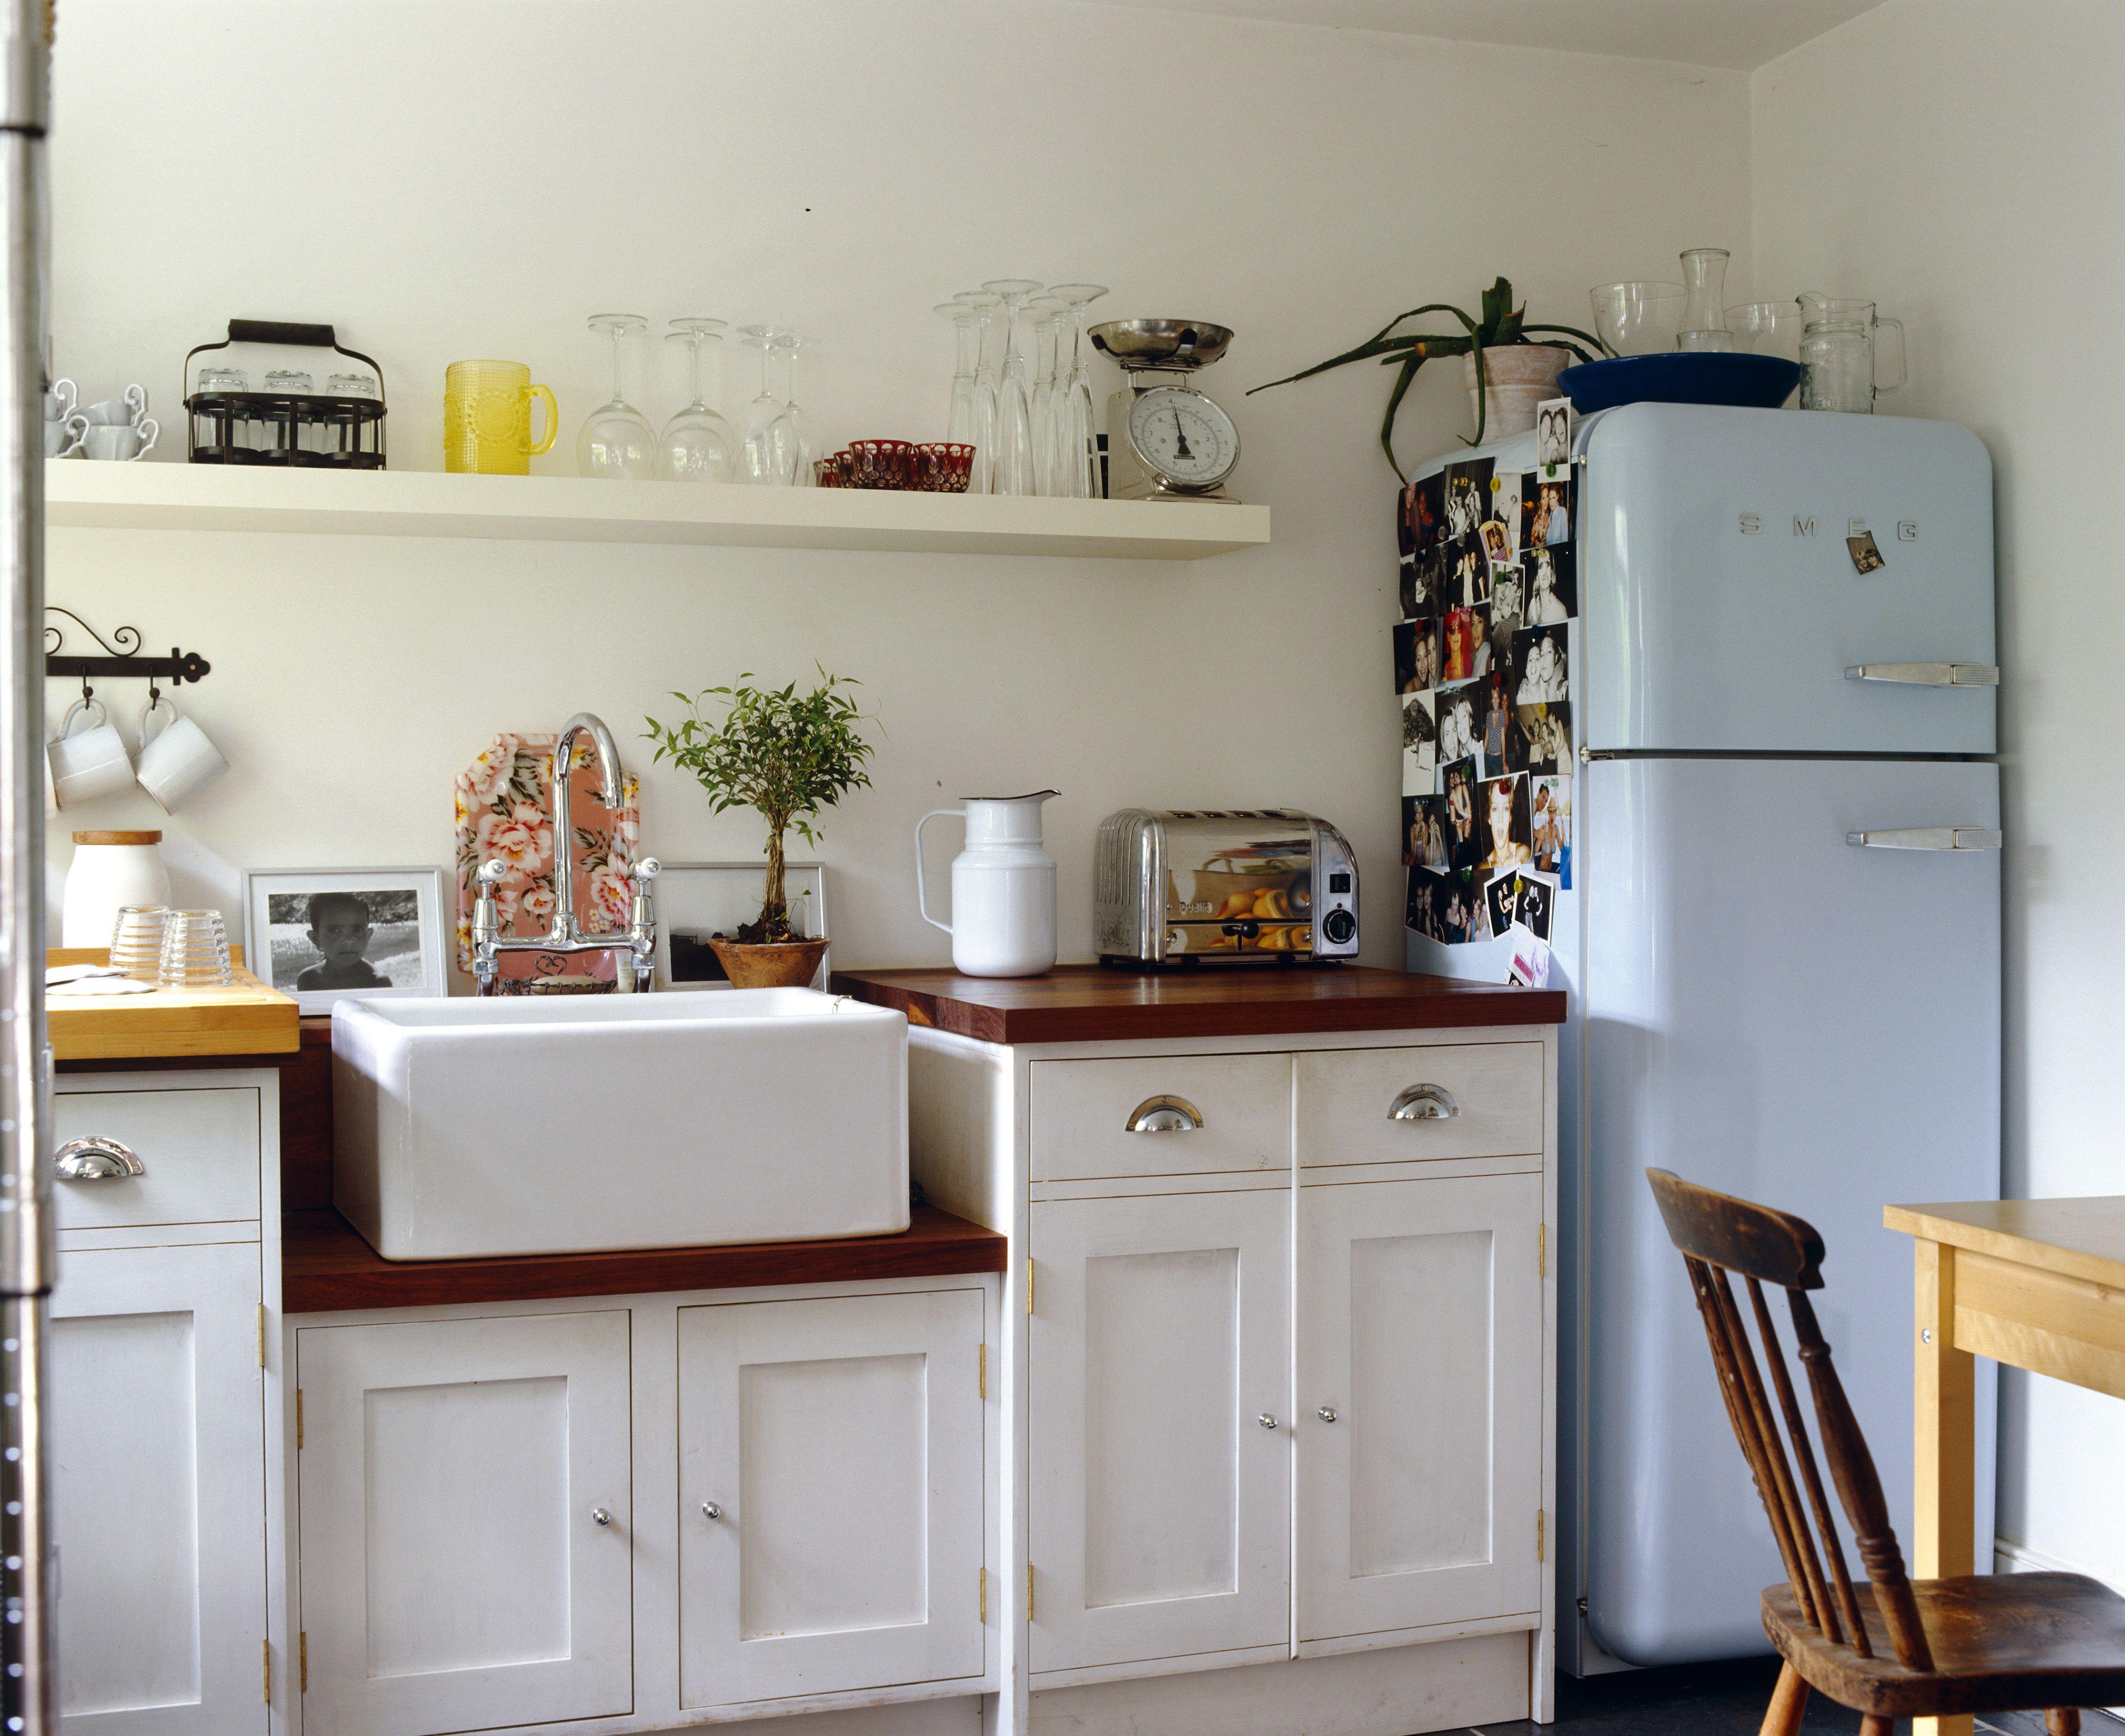 Kitchen with light blue refrigerator.